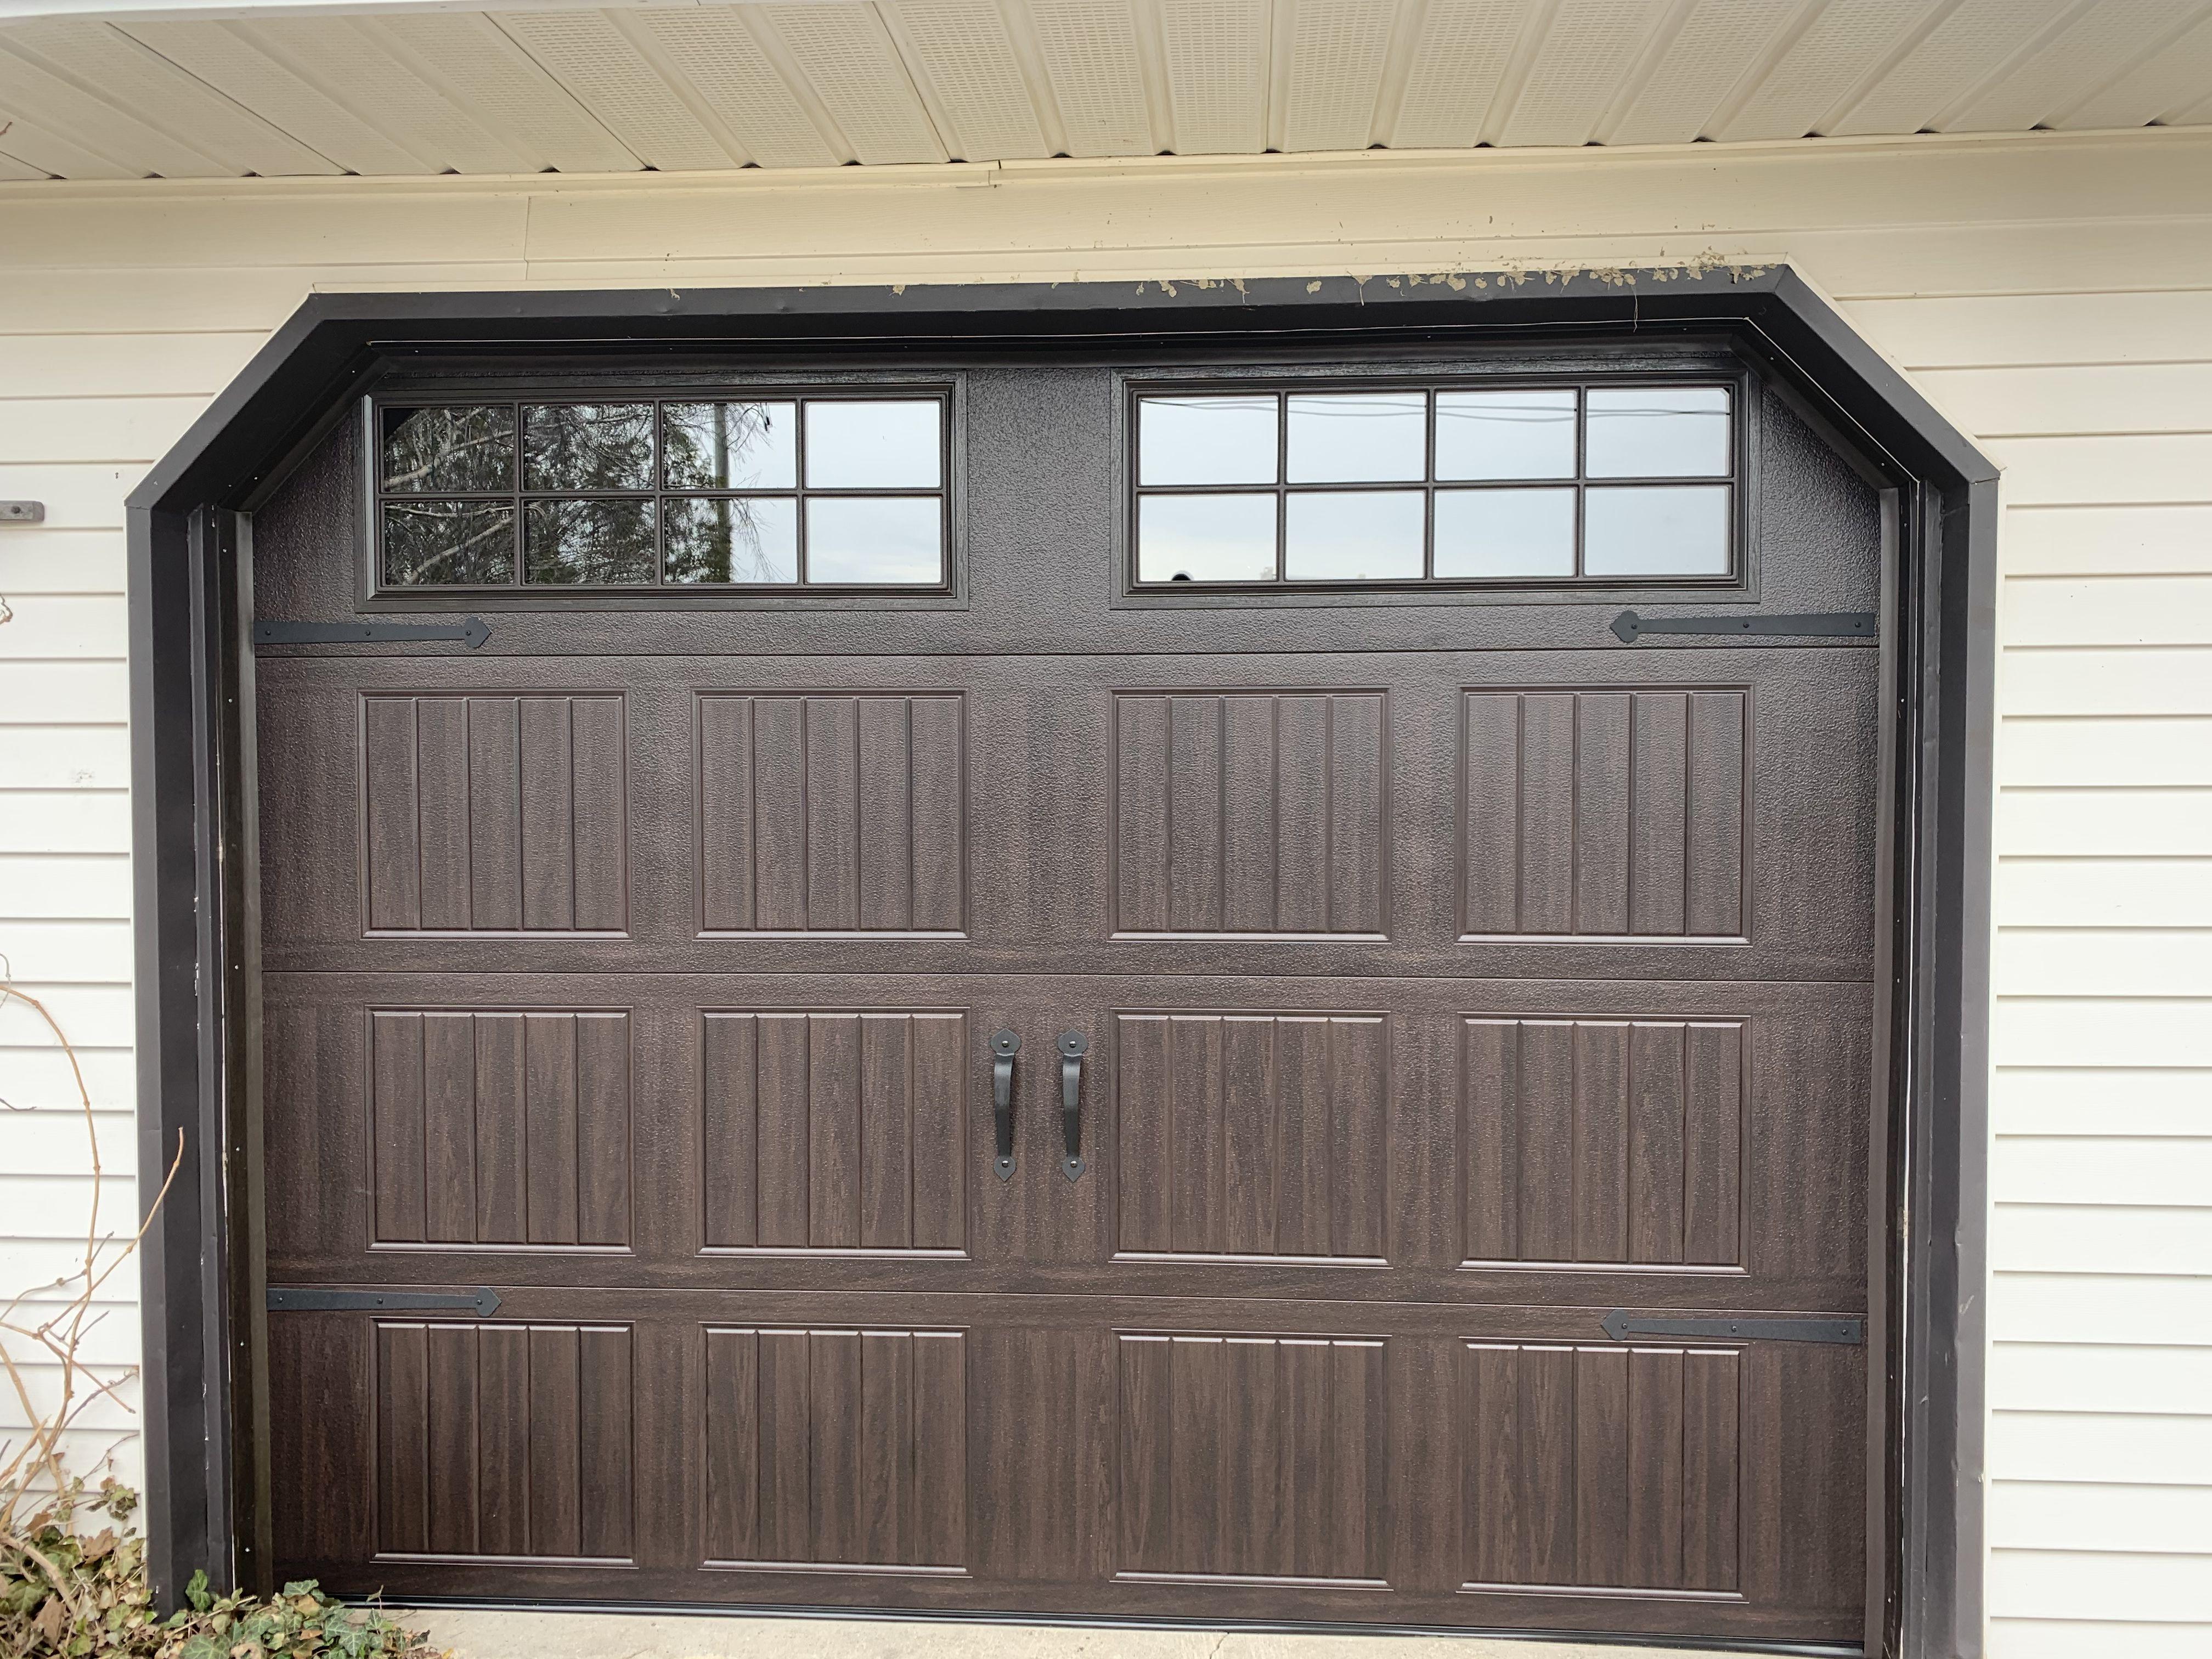 Wayne Dalton Garage Doors In 2020 Garage Doors Carriage House